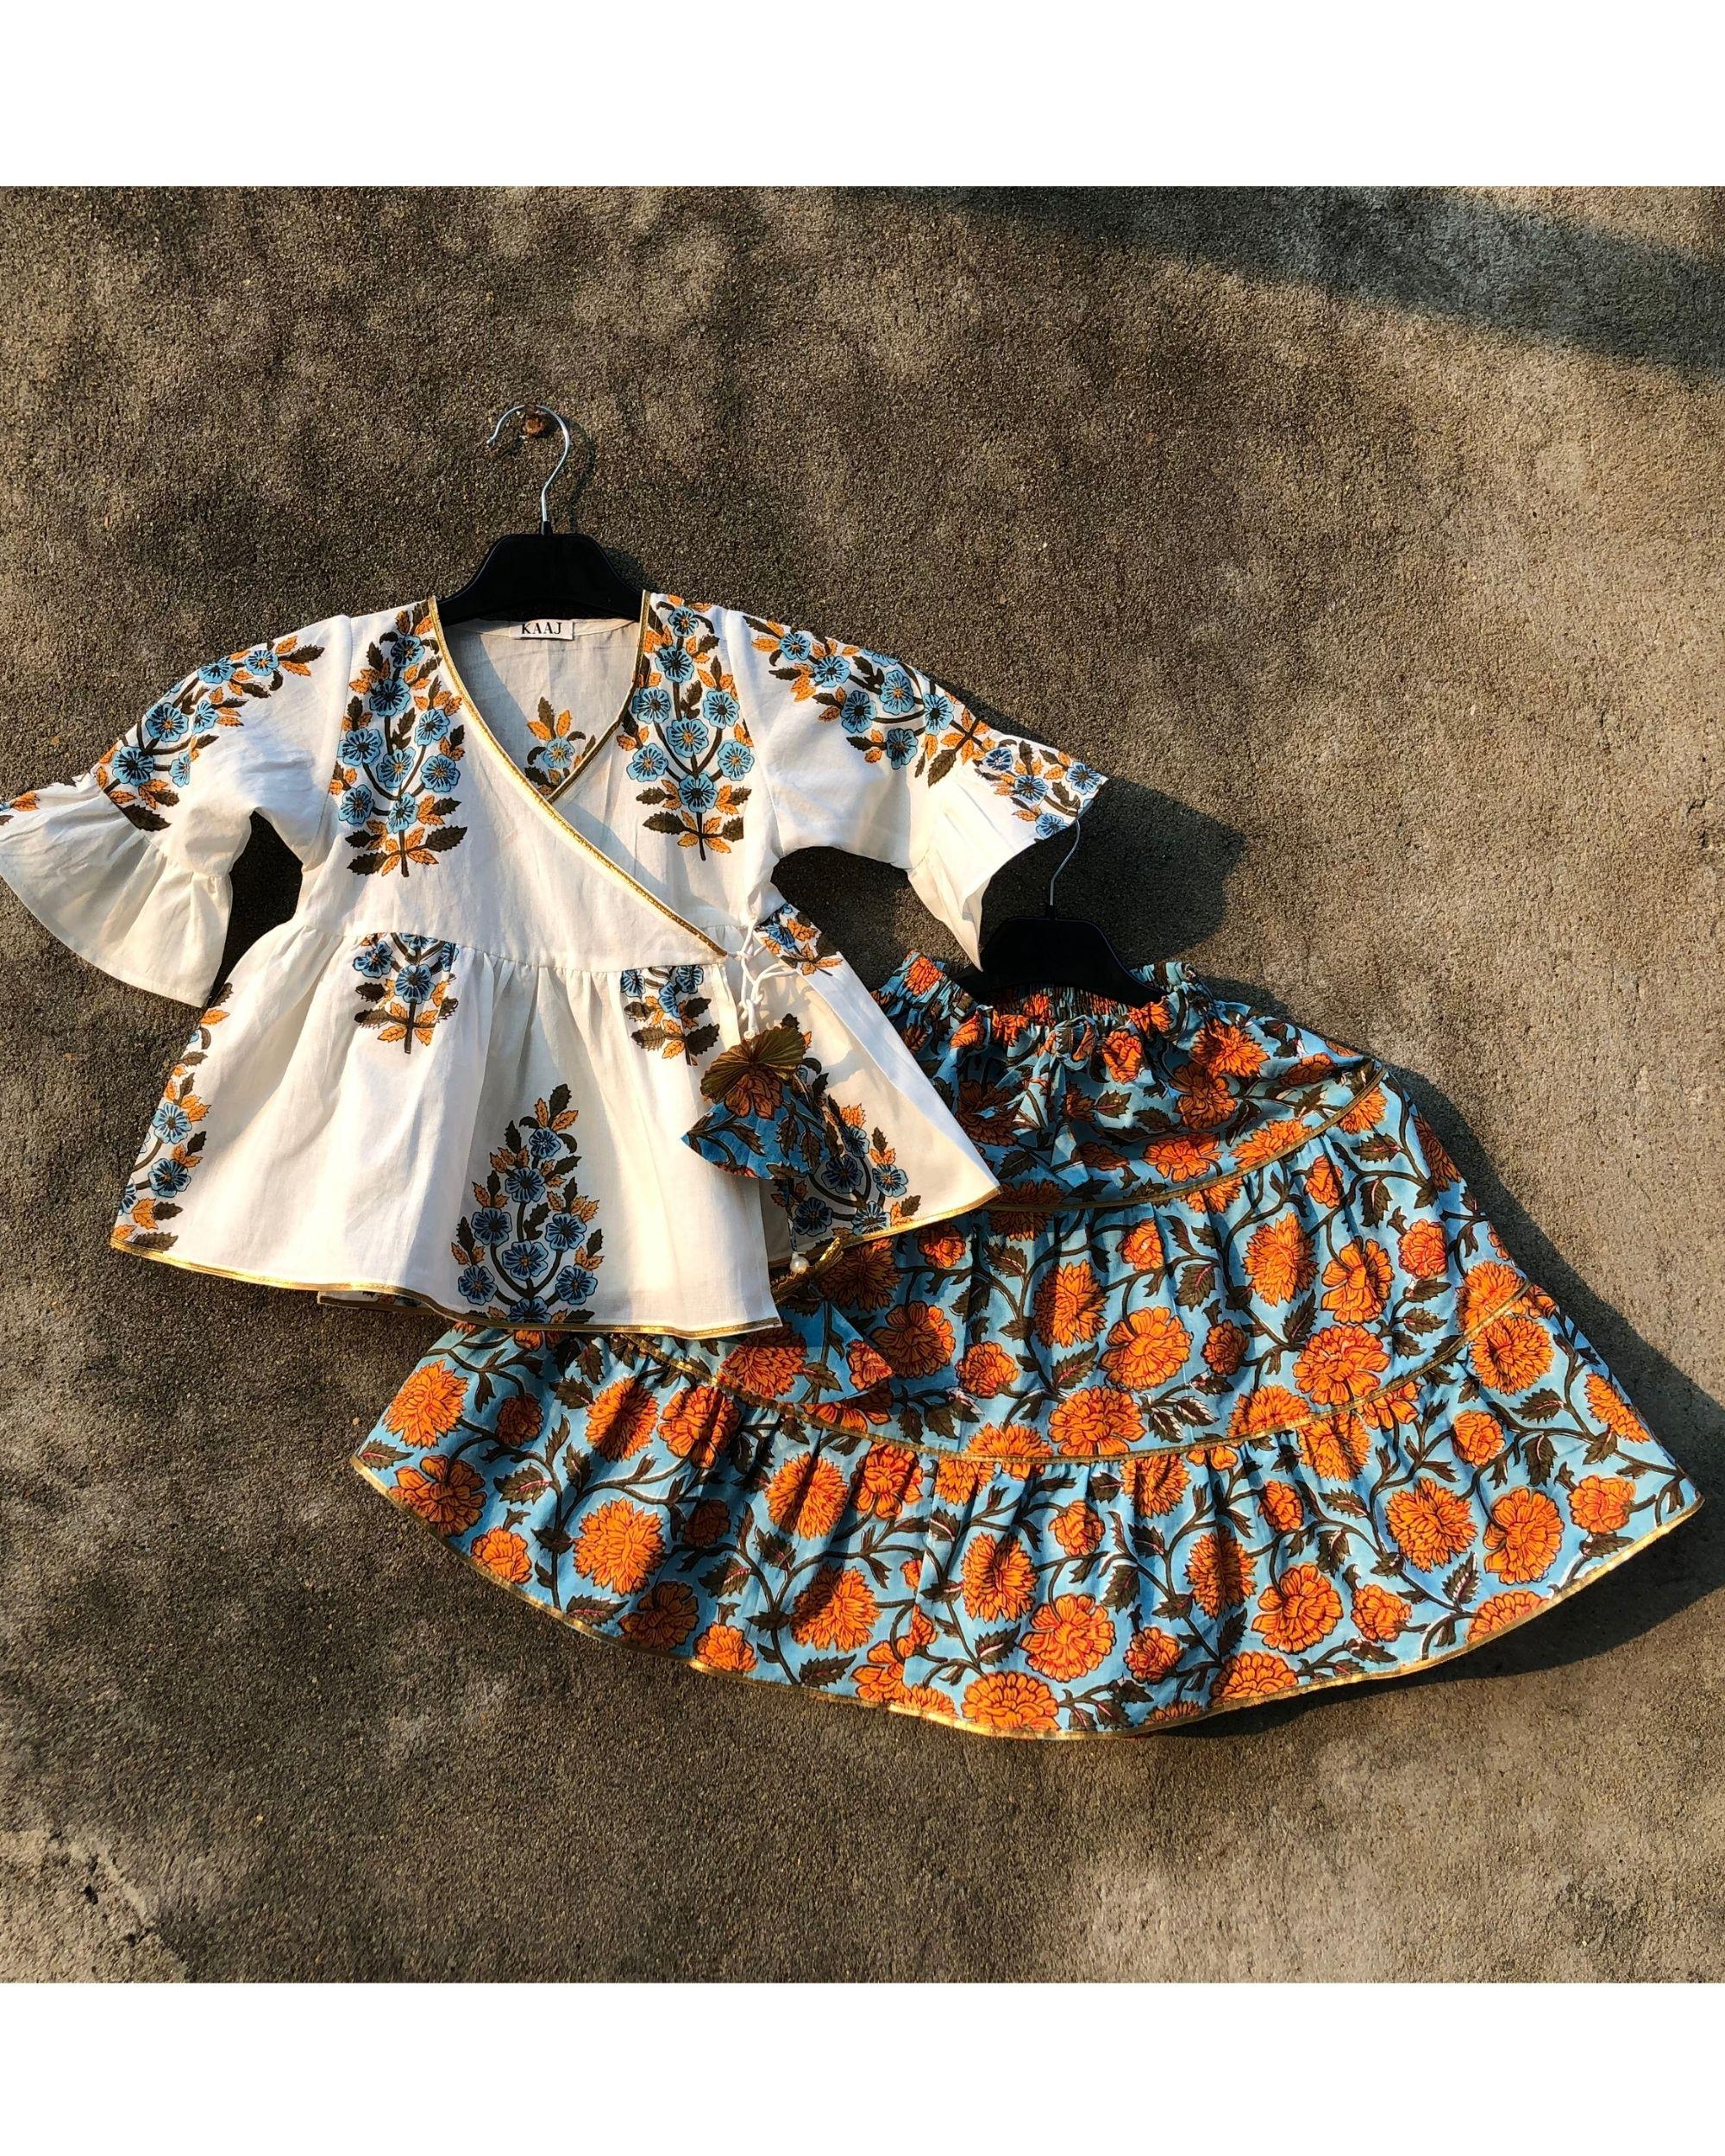 Marigold angrakha lehenga set - set of two